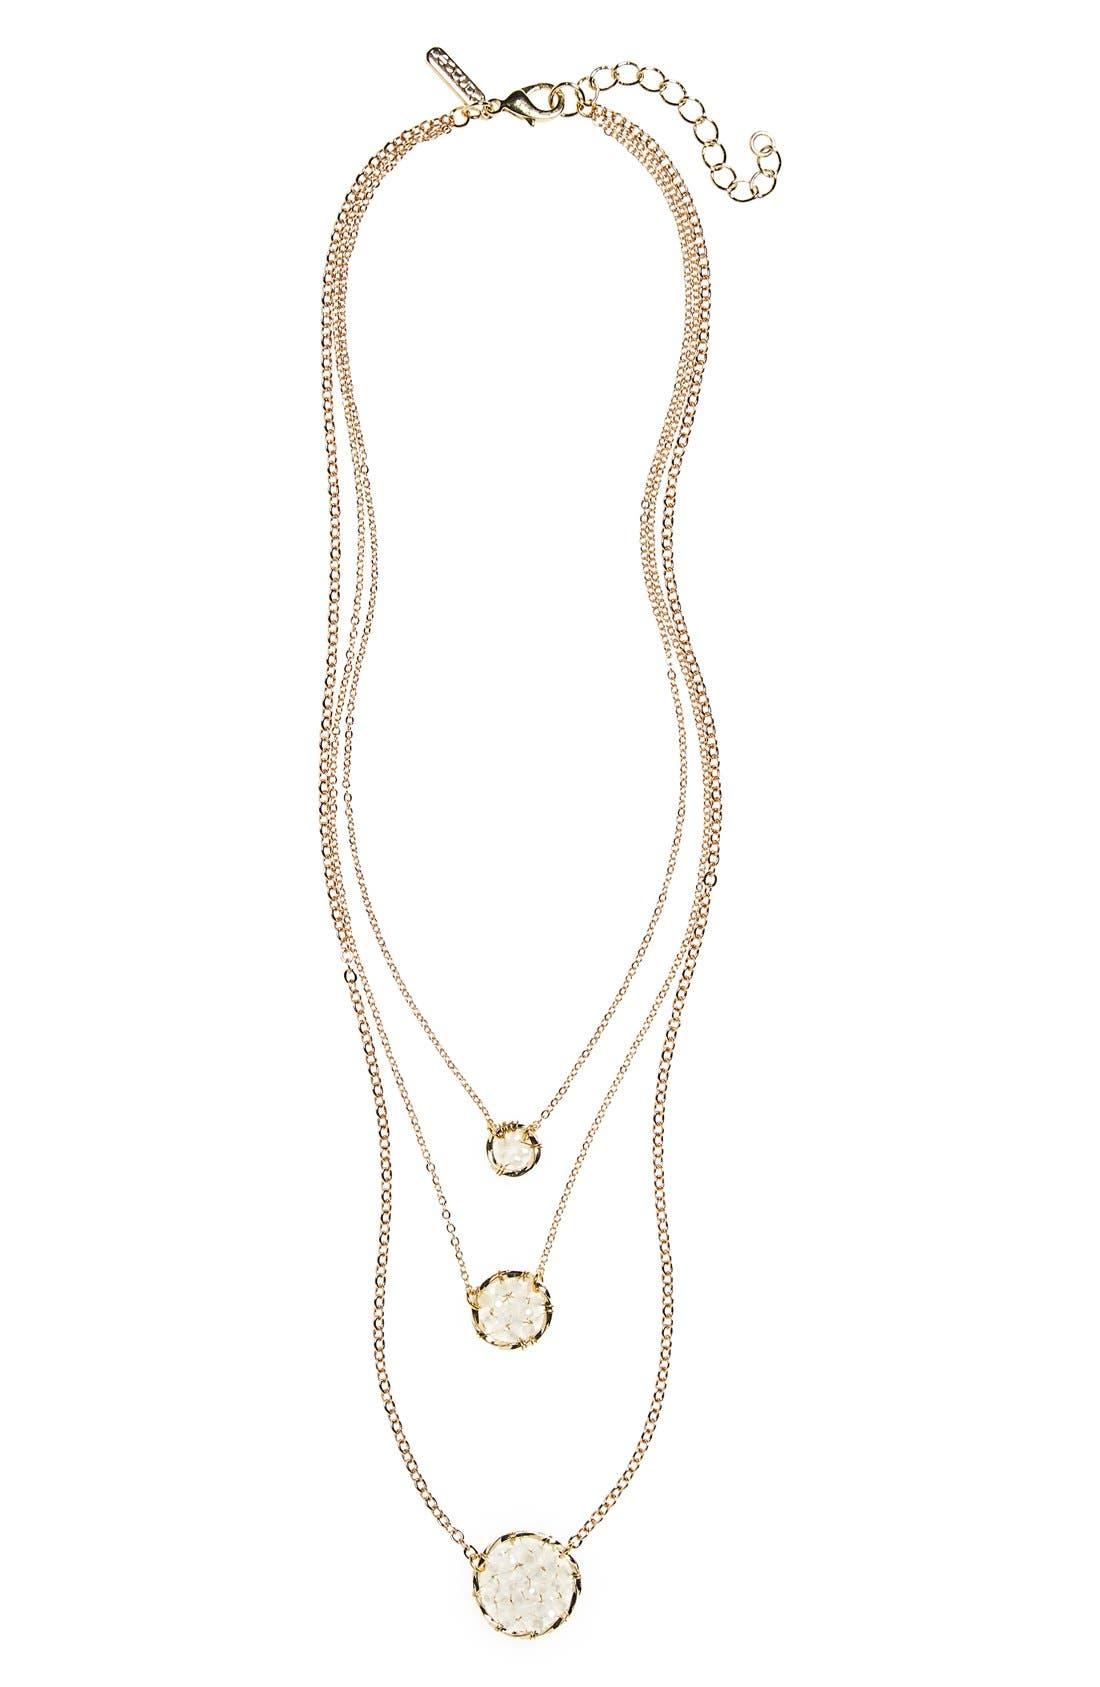 Main Image - Panacea Beaded Crystal Pendant Layered Necklace